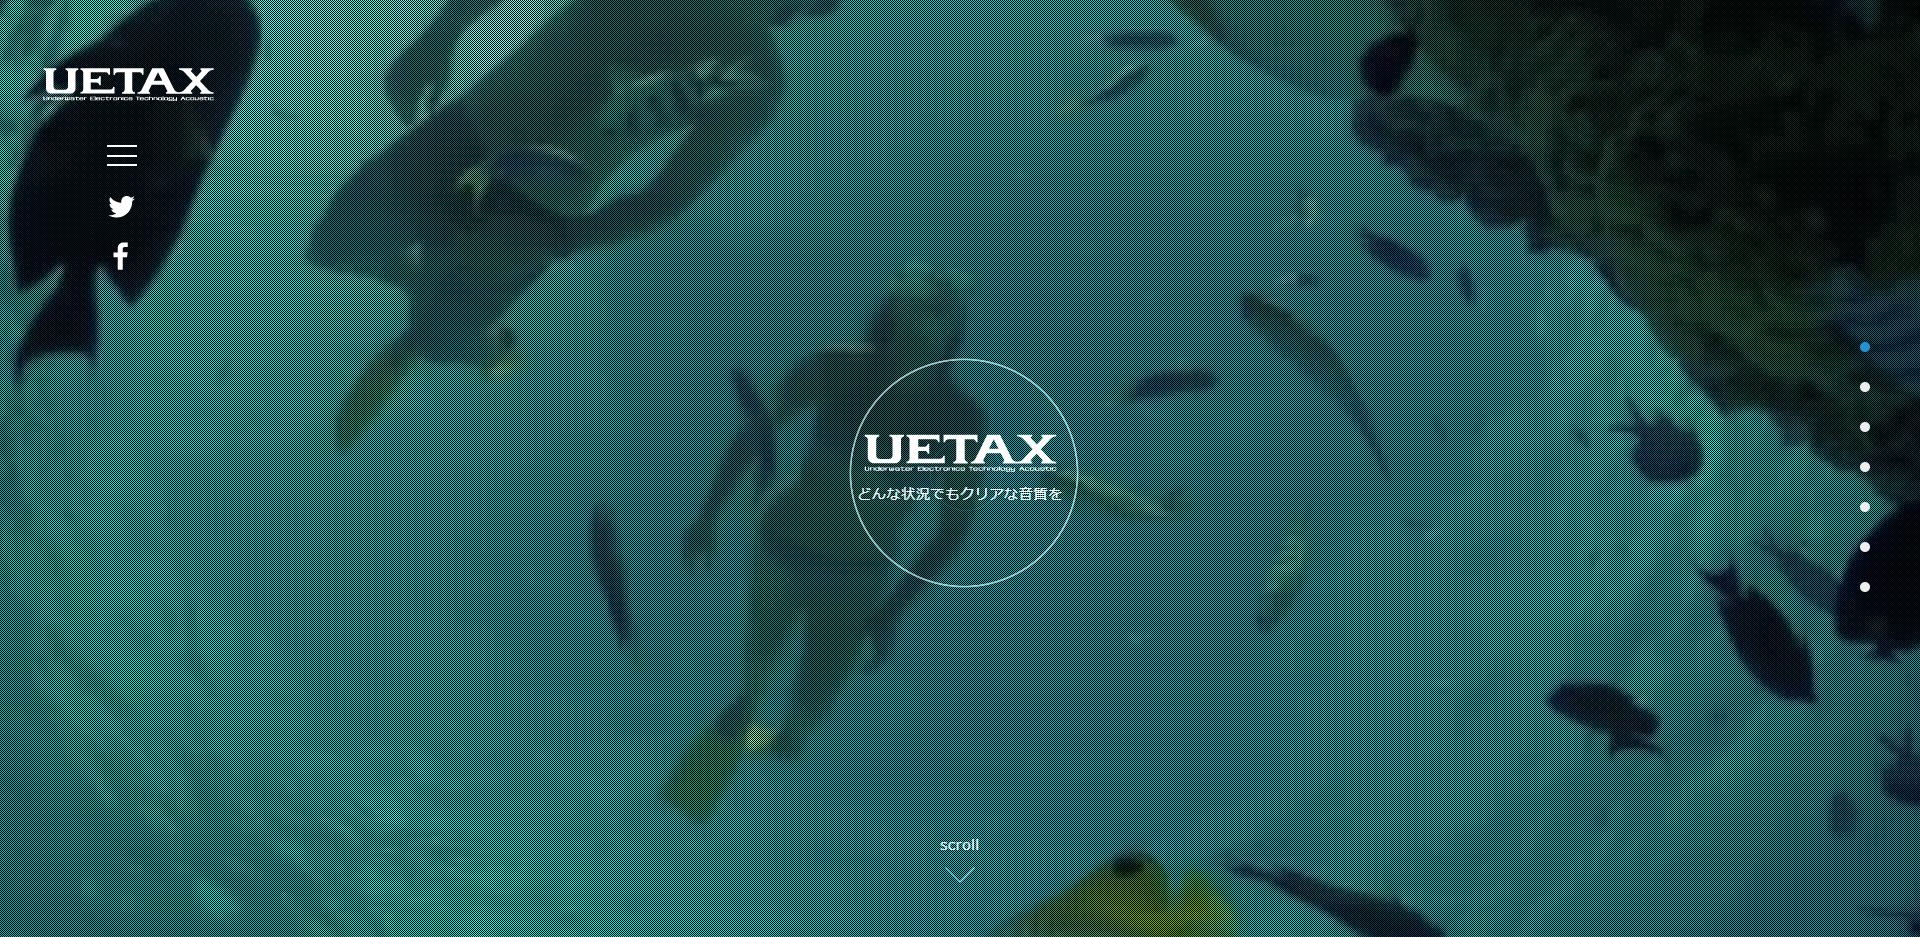 uetax website